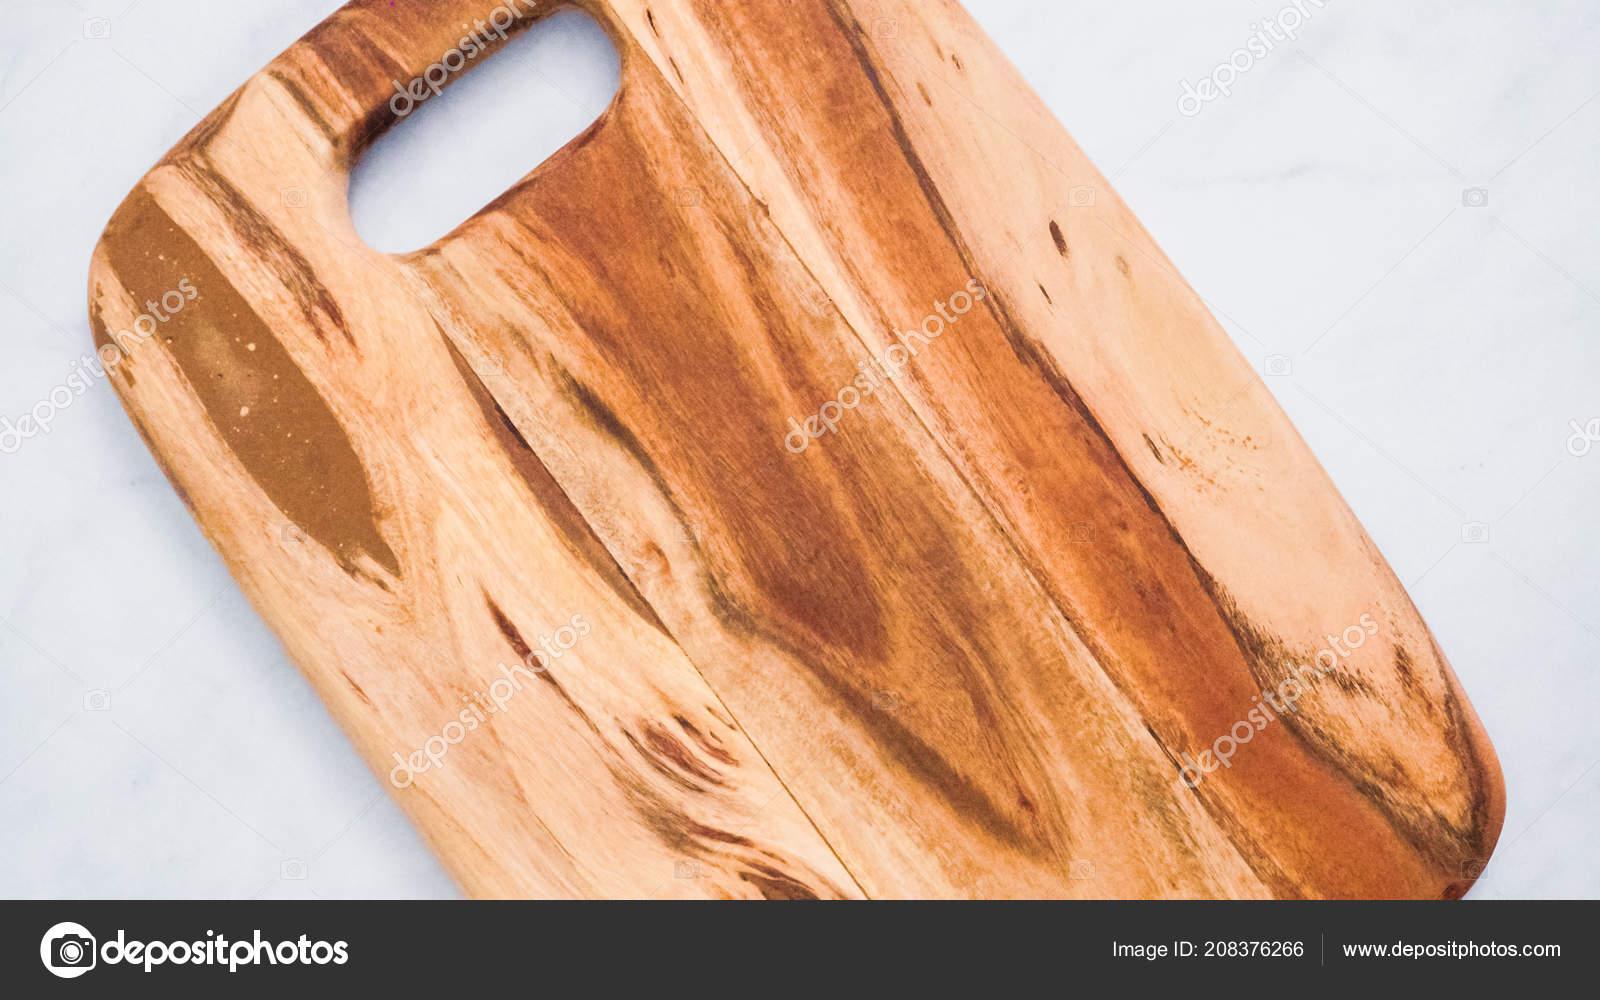 Rustic Wood Cutting Board Marble Kitchen Counter Stock Photo C Urban Light 208376266